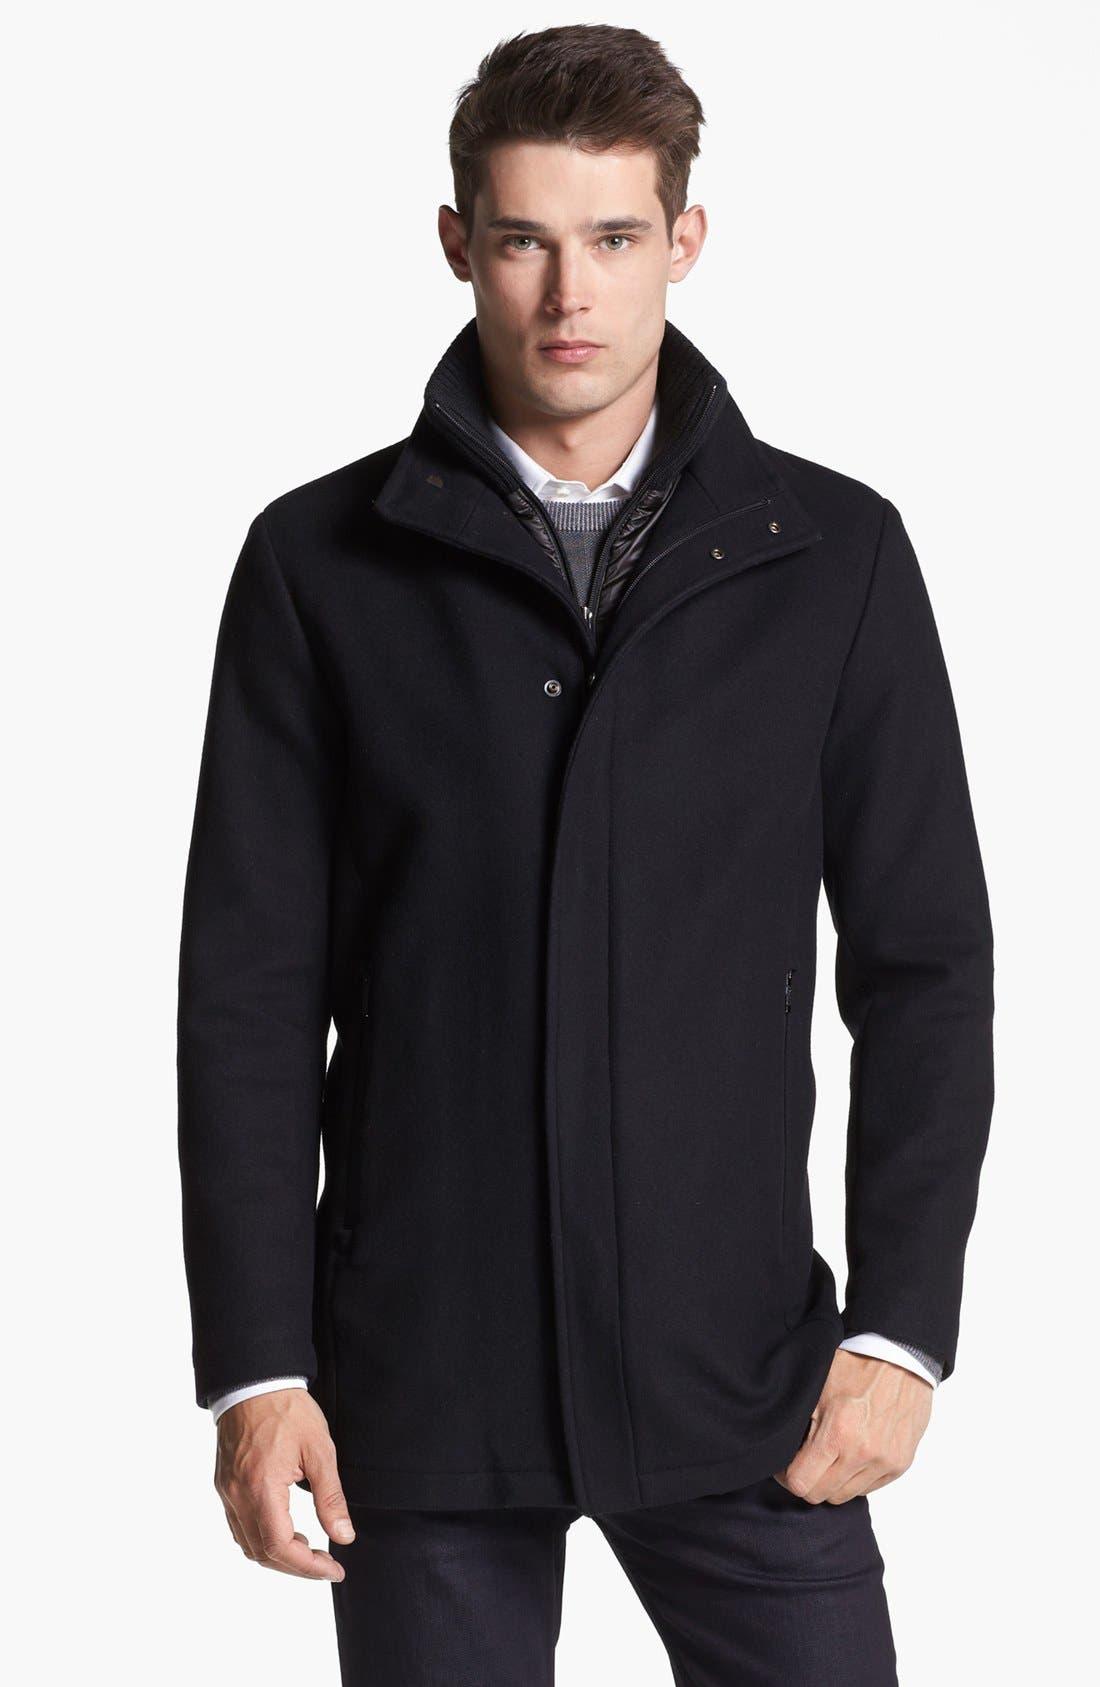 Alternate Image 1 Selected - Armani Collezioni Wool Blend Winter Jacket